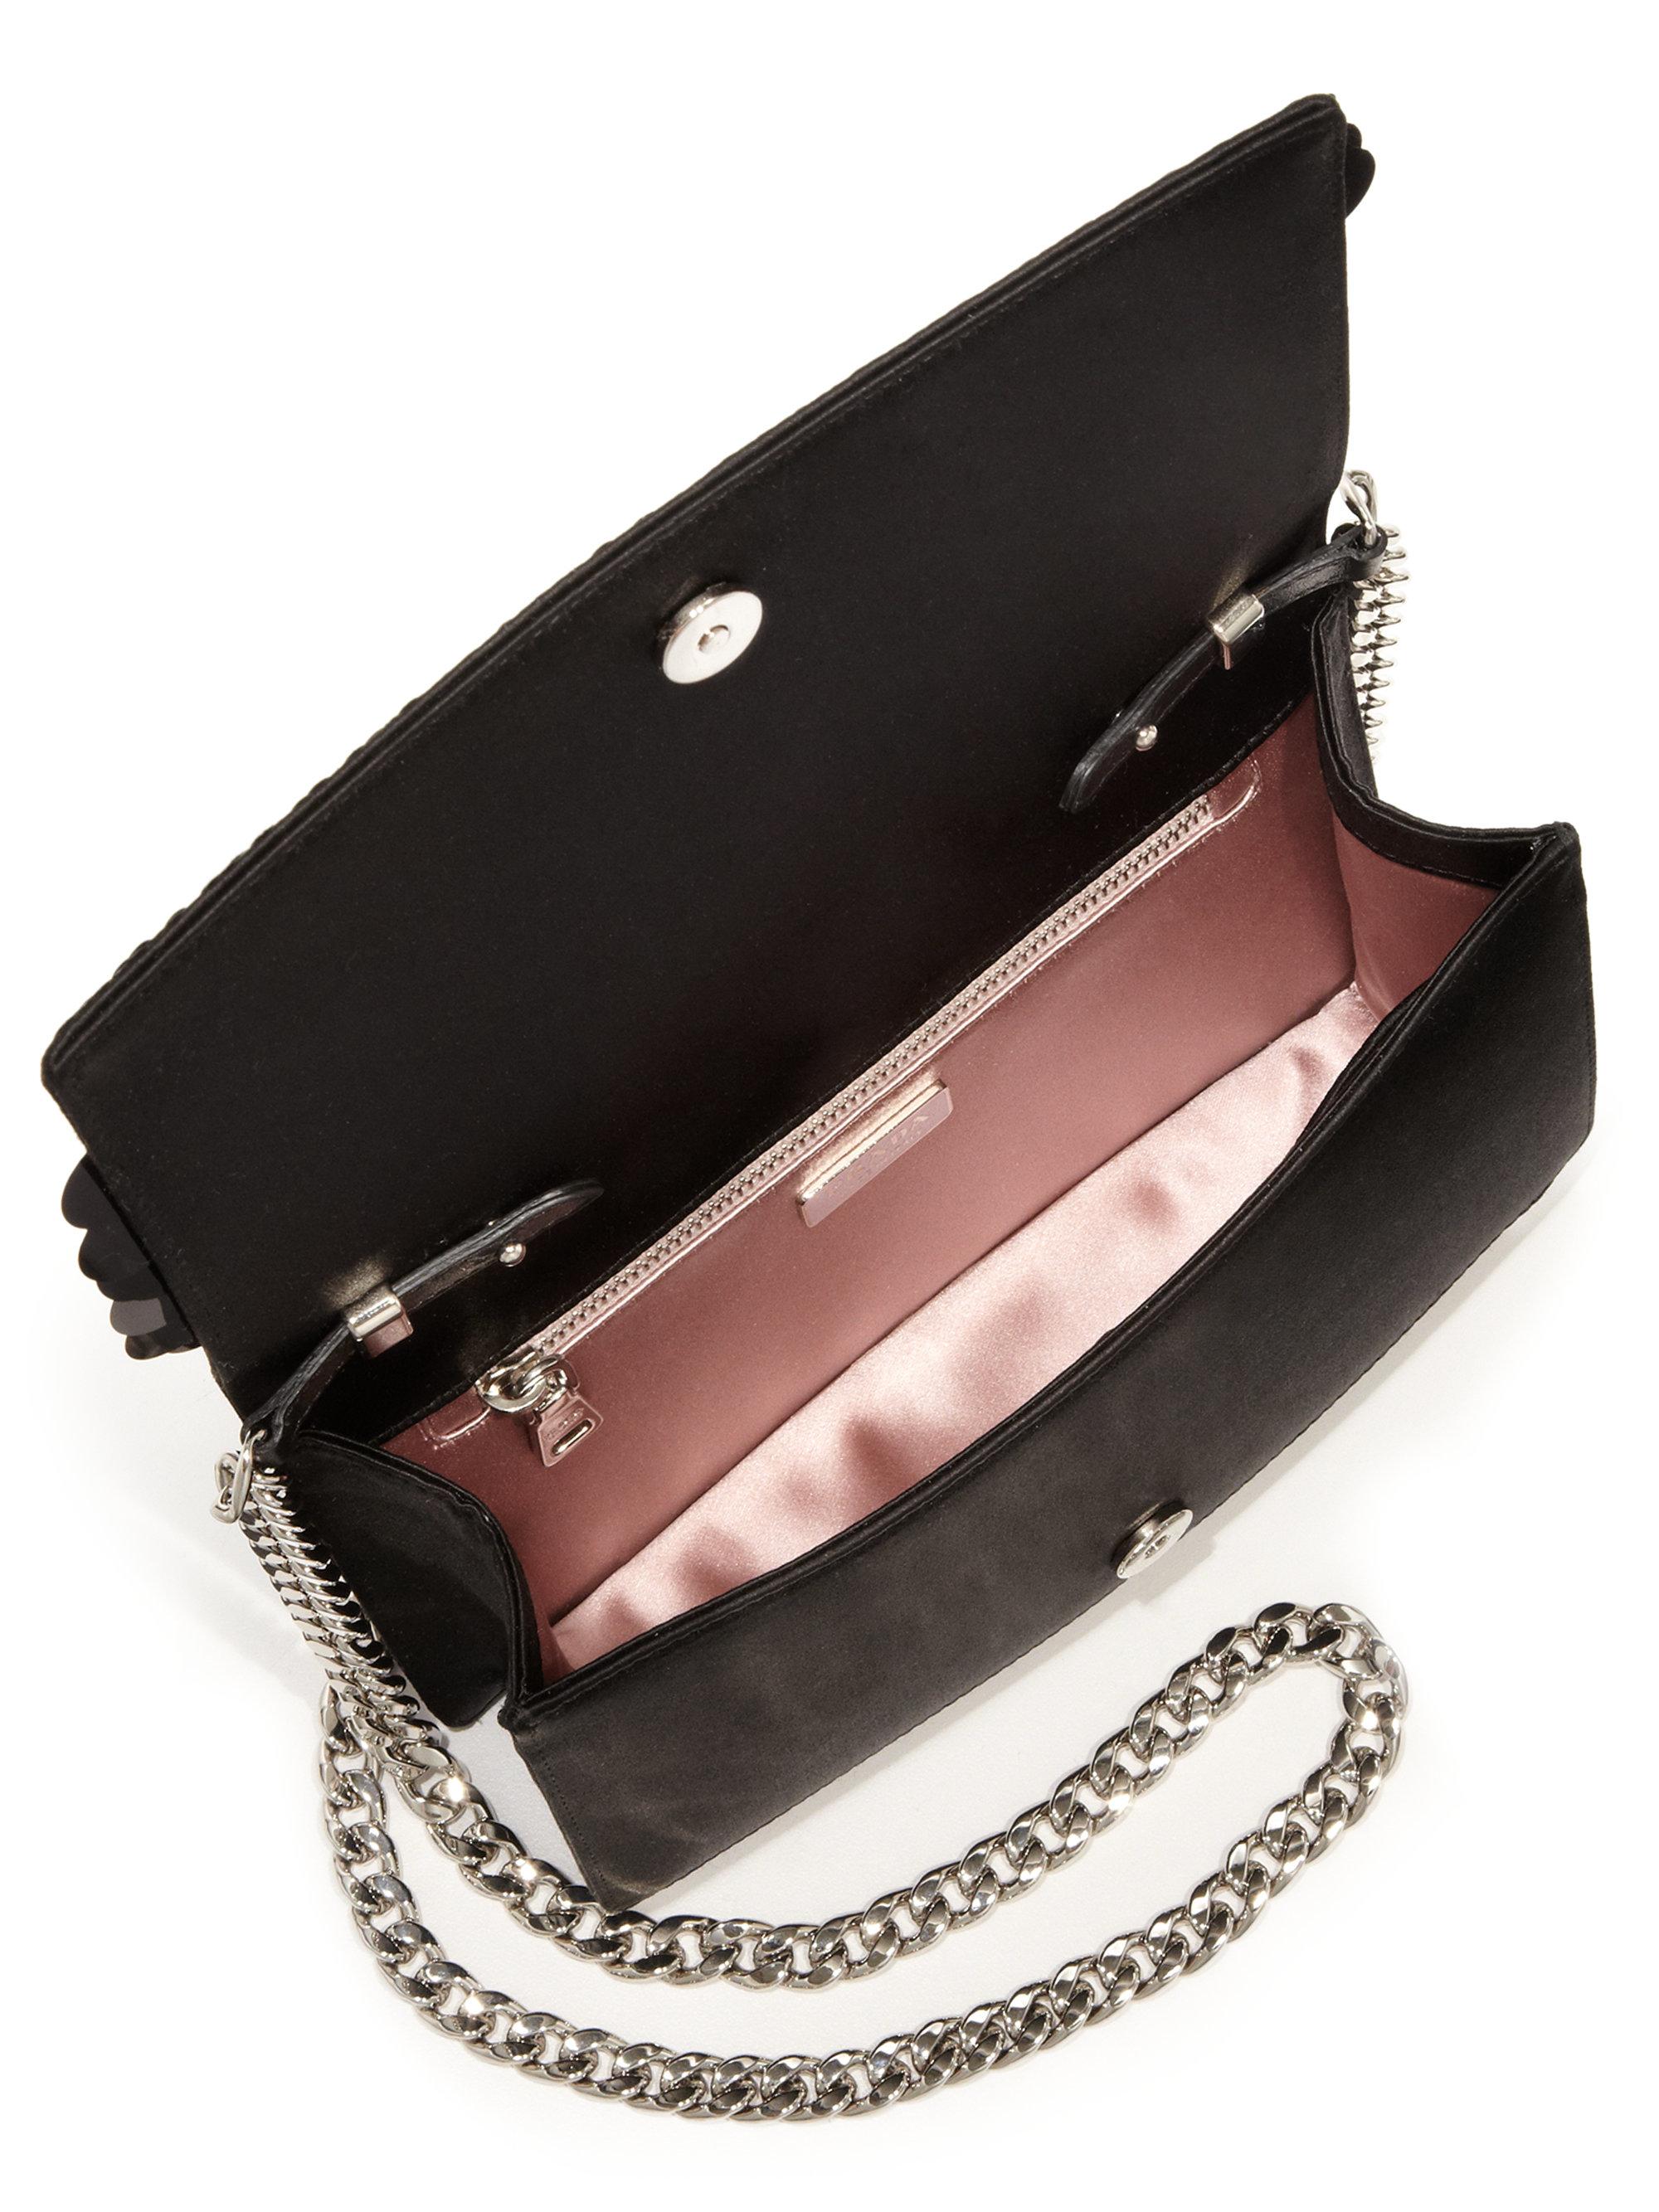 d06a972c89 italy prada satin raso framed evening bag pink 26431 2cbfb 00d24   switzerland lyst prada paillete evening clutch in black ef6a5 afa90